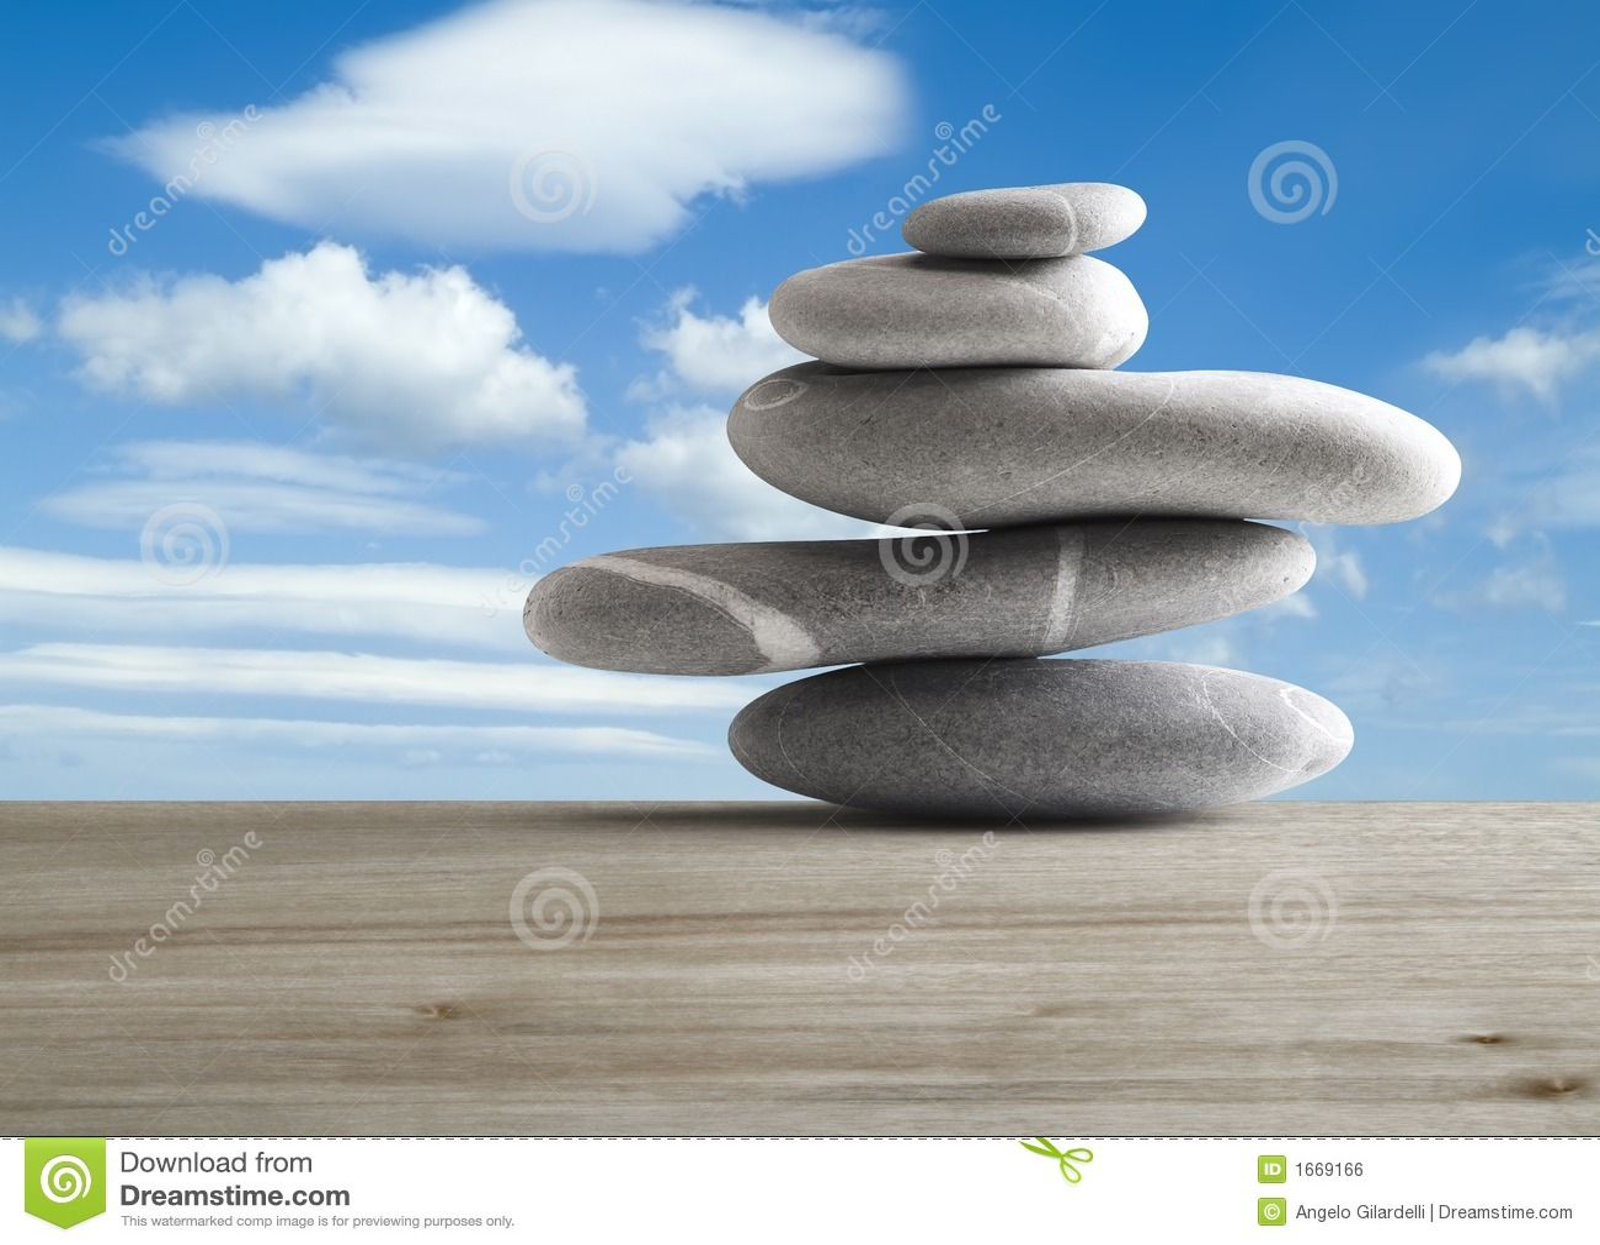 Pile of five stones